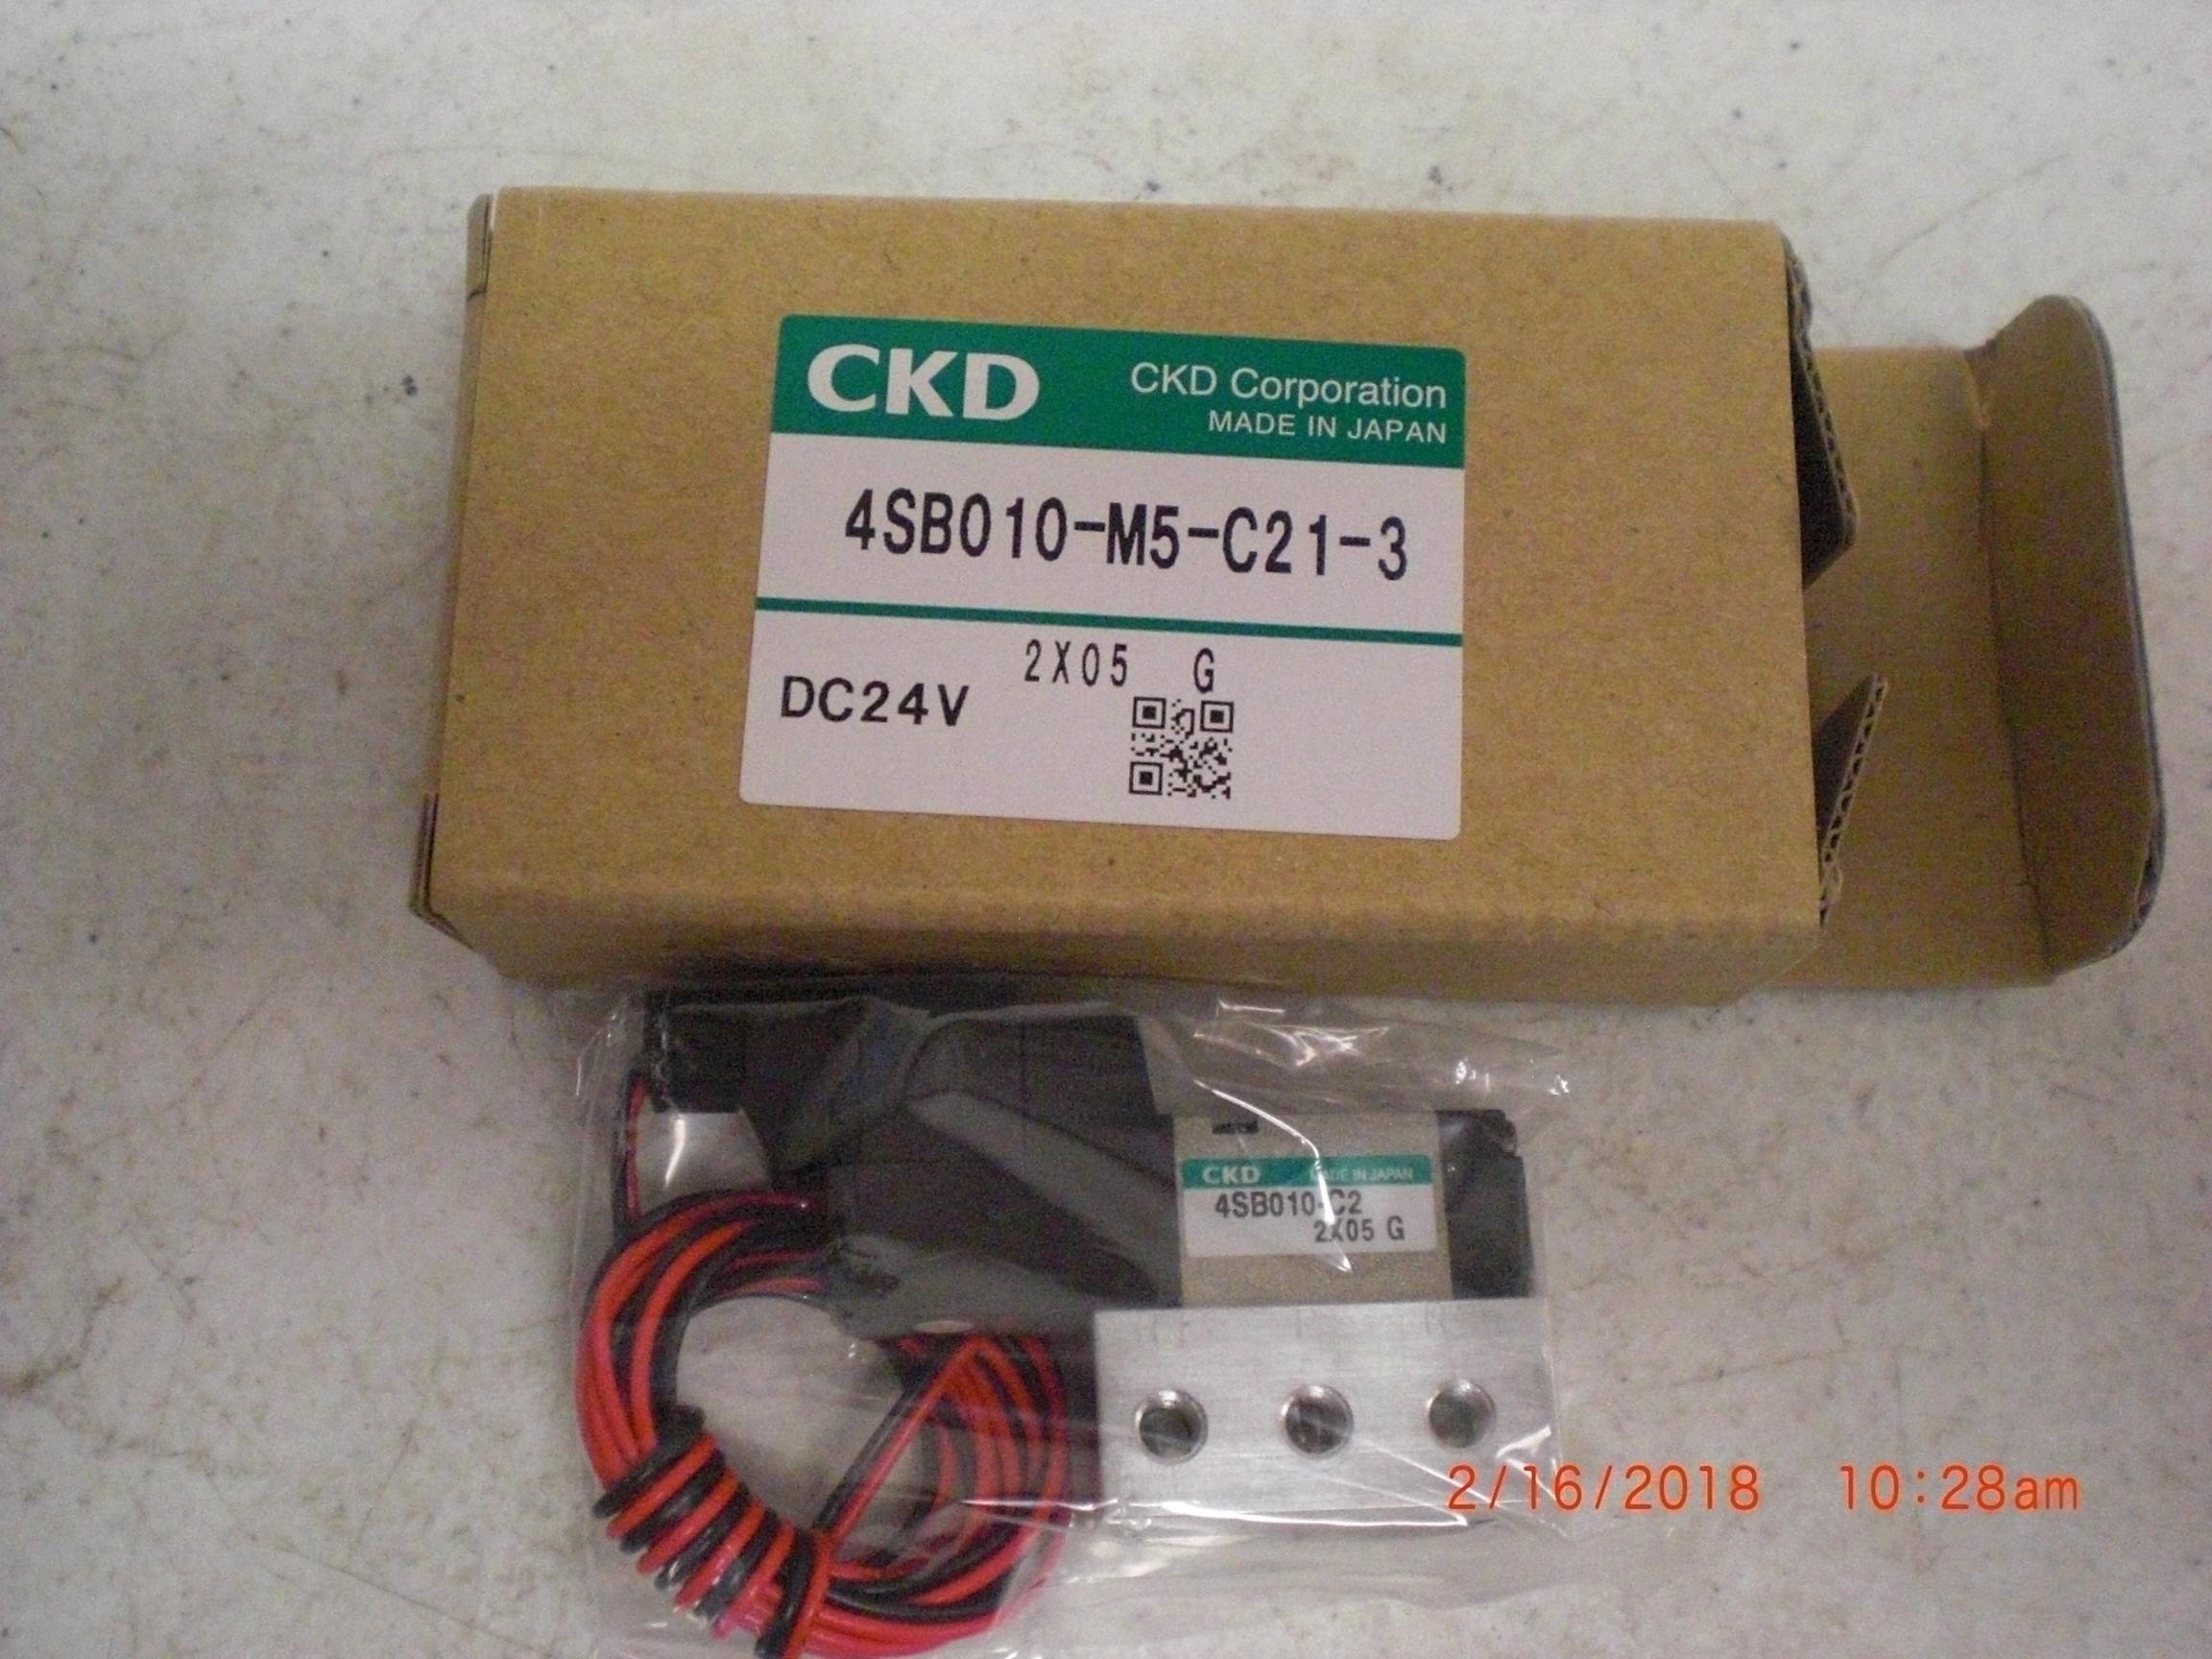 Valve CKD 4SB010-M5-C21-3 solenoid DC24V